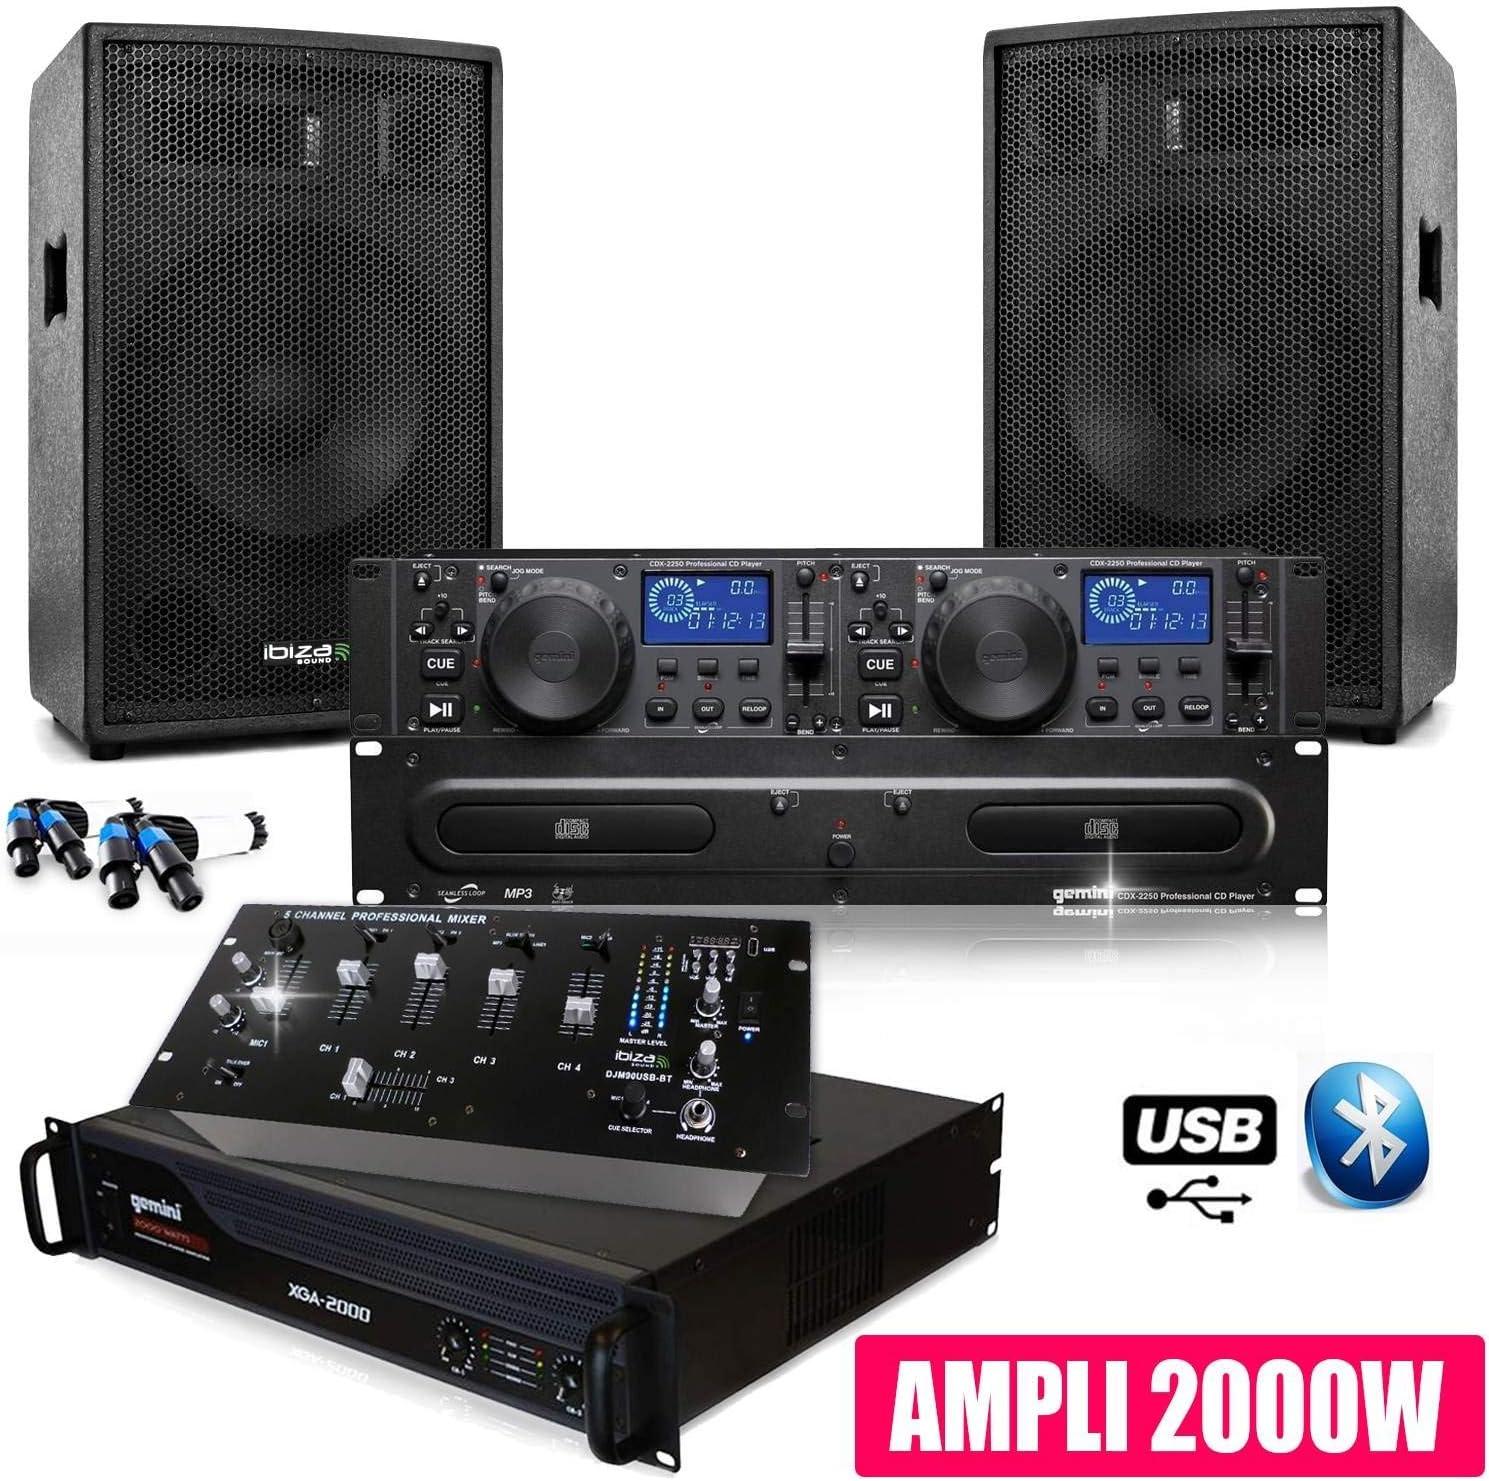 Pack SONO DJ Complet CLUB12 Ampli Gemini Table Mix: Amazon.es ...